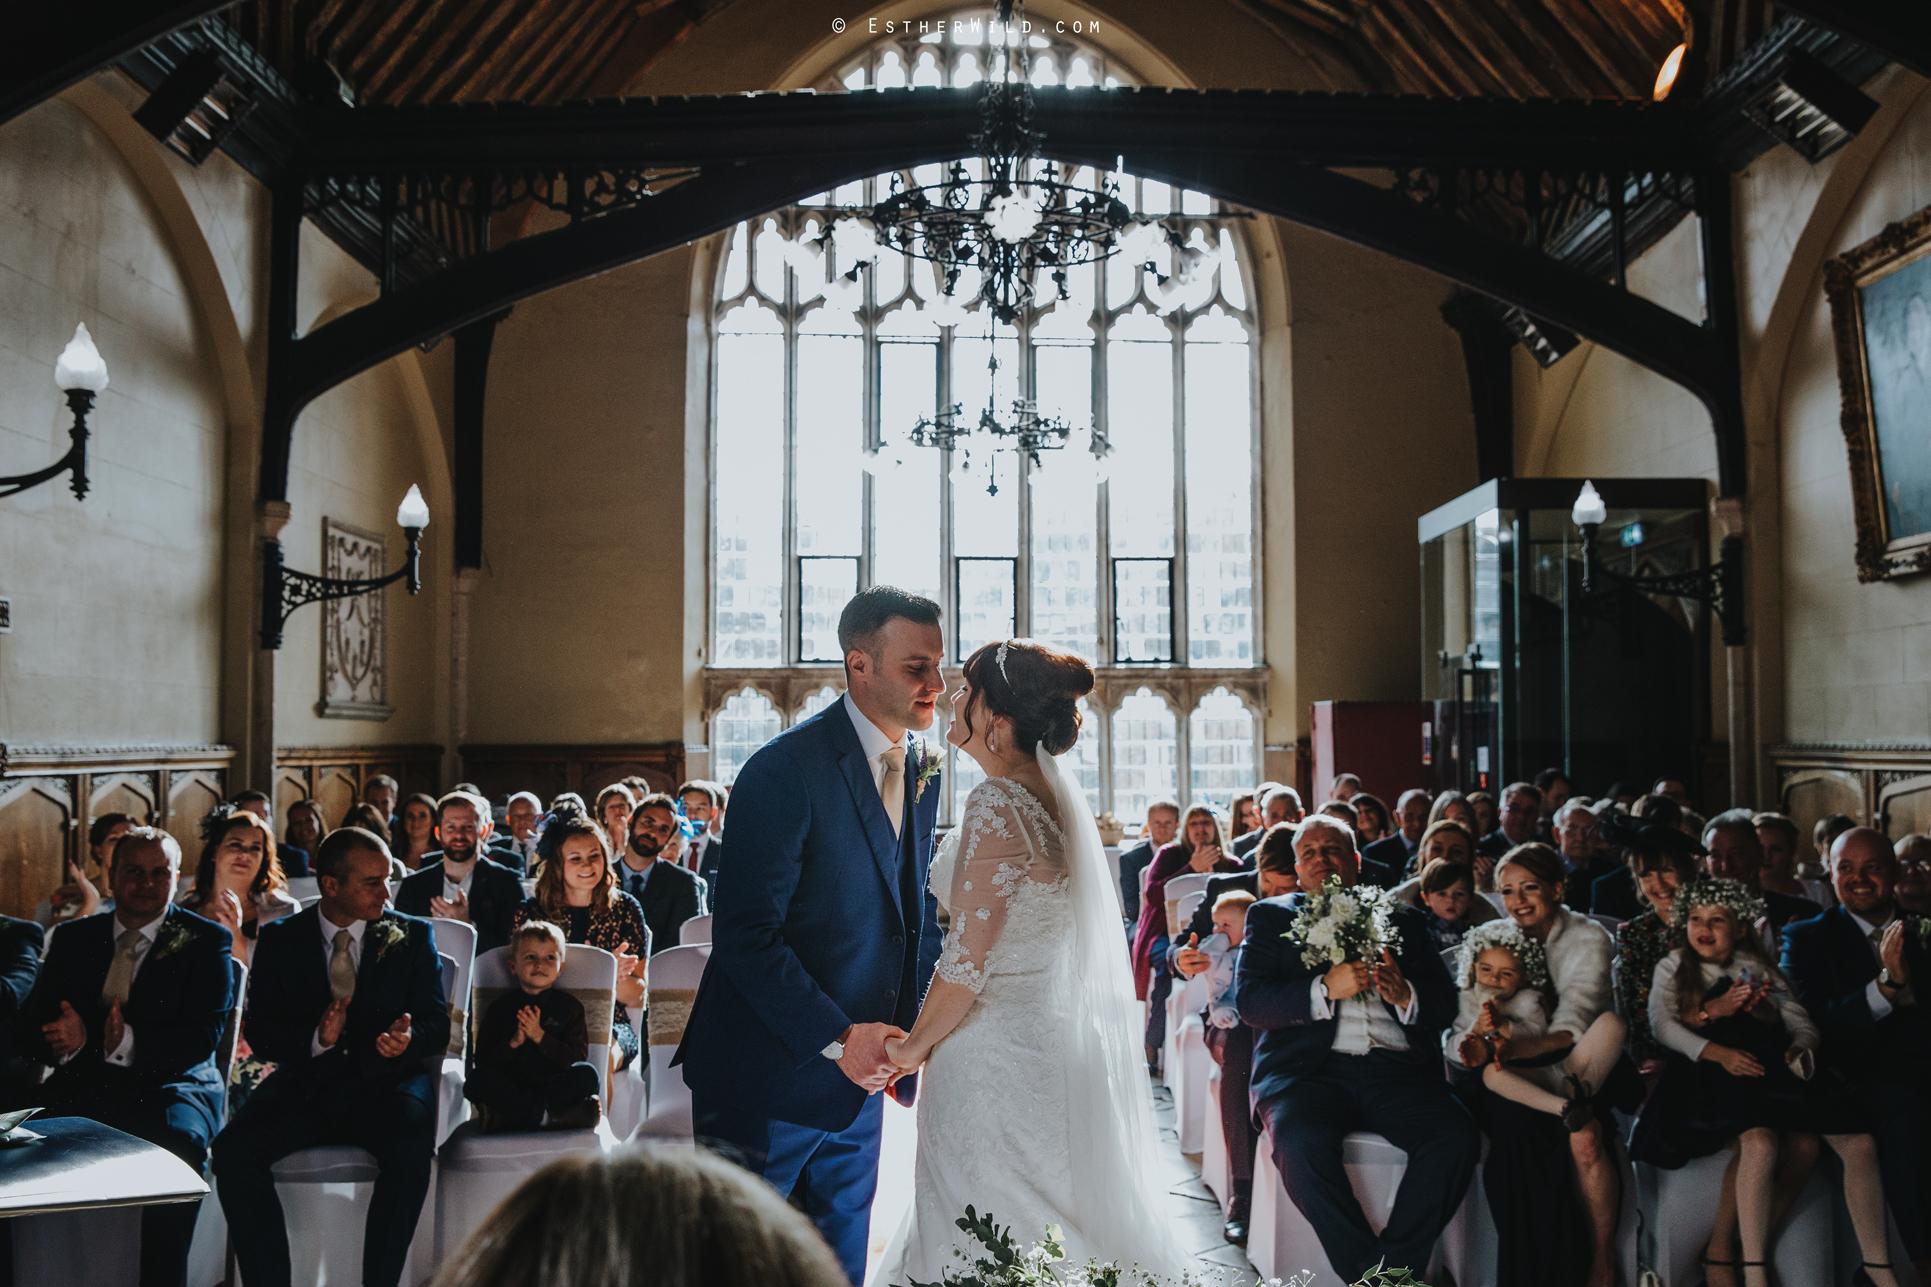 1017_Kings_Lynn_Town_Hall_Bank_House_Hotel_Wedding_Esther_Wild_PhotograpgherIMG_5052.jpg